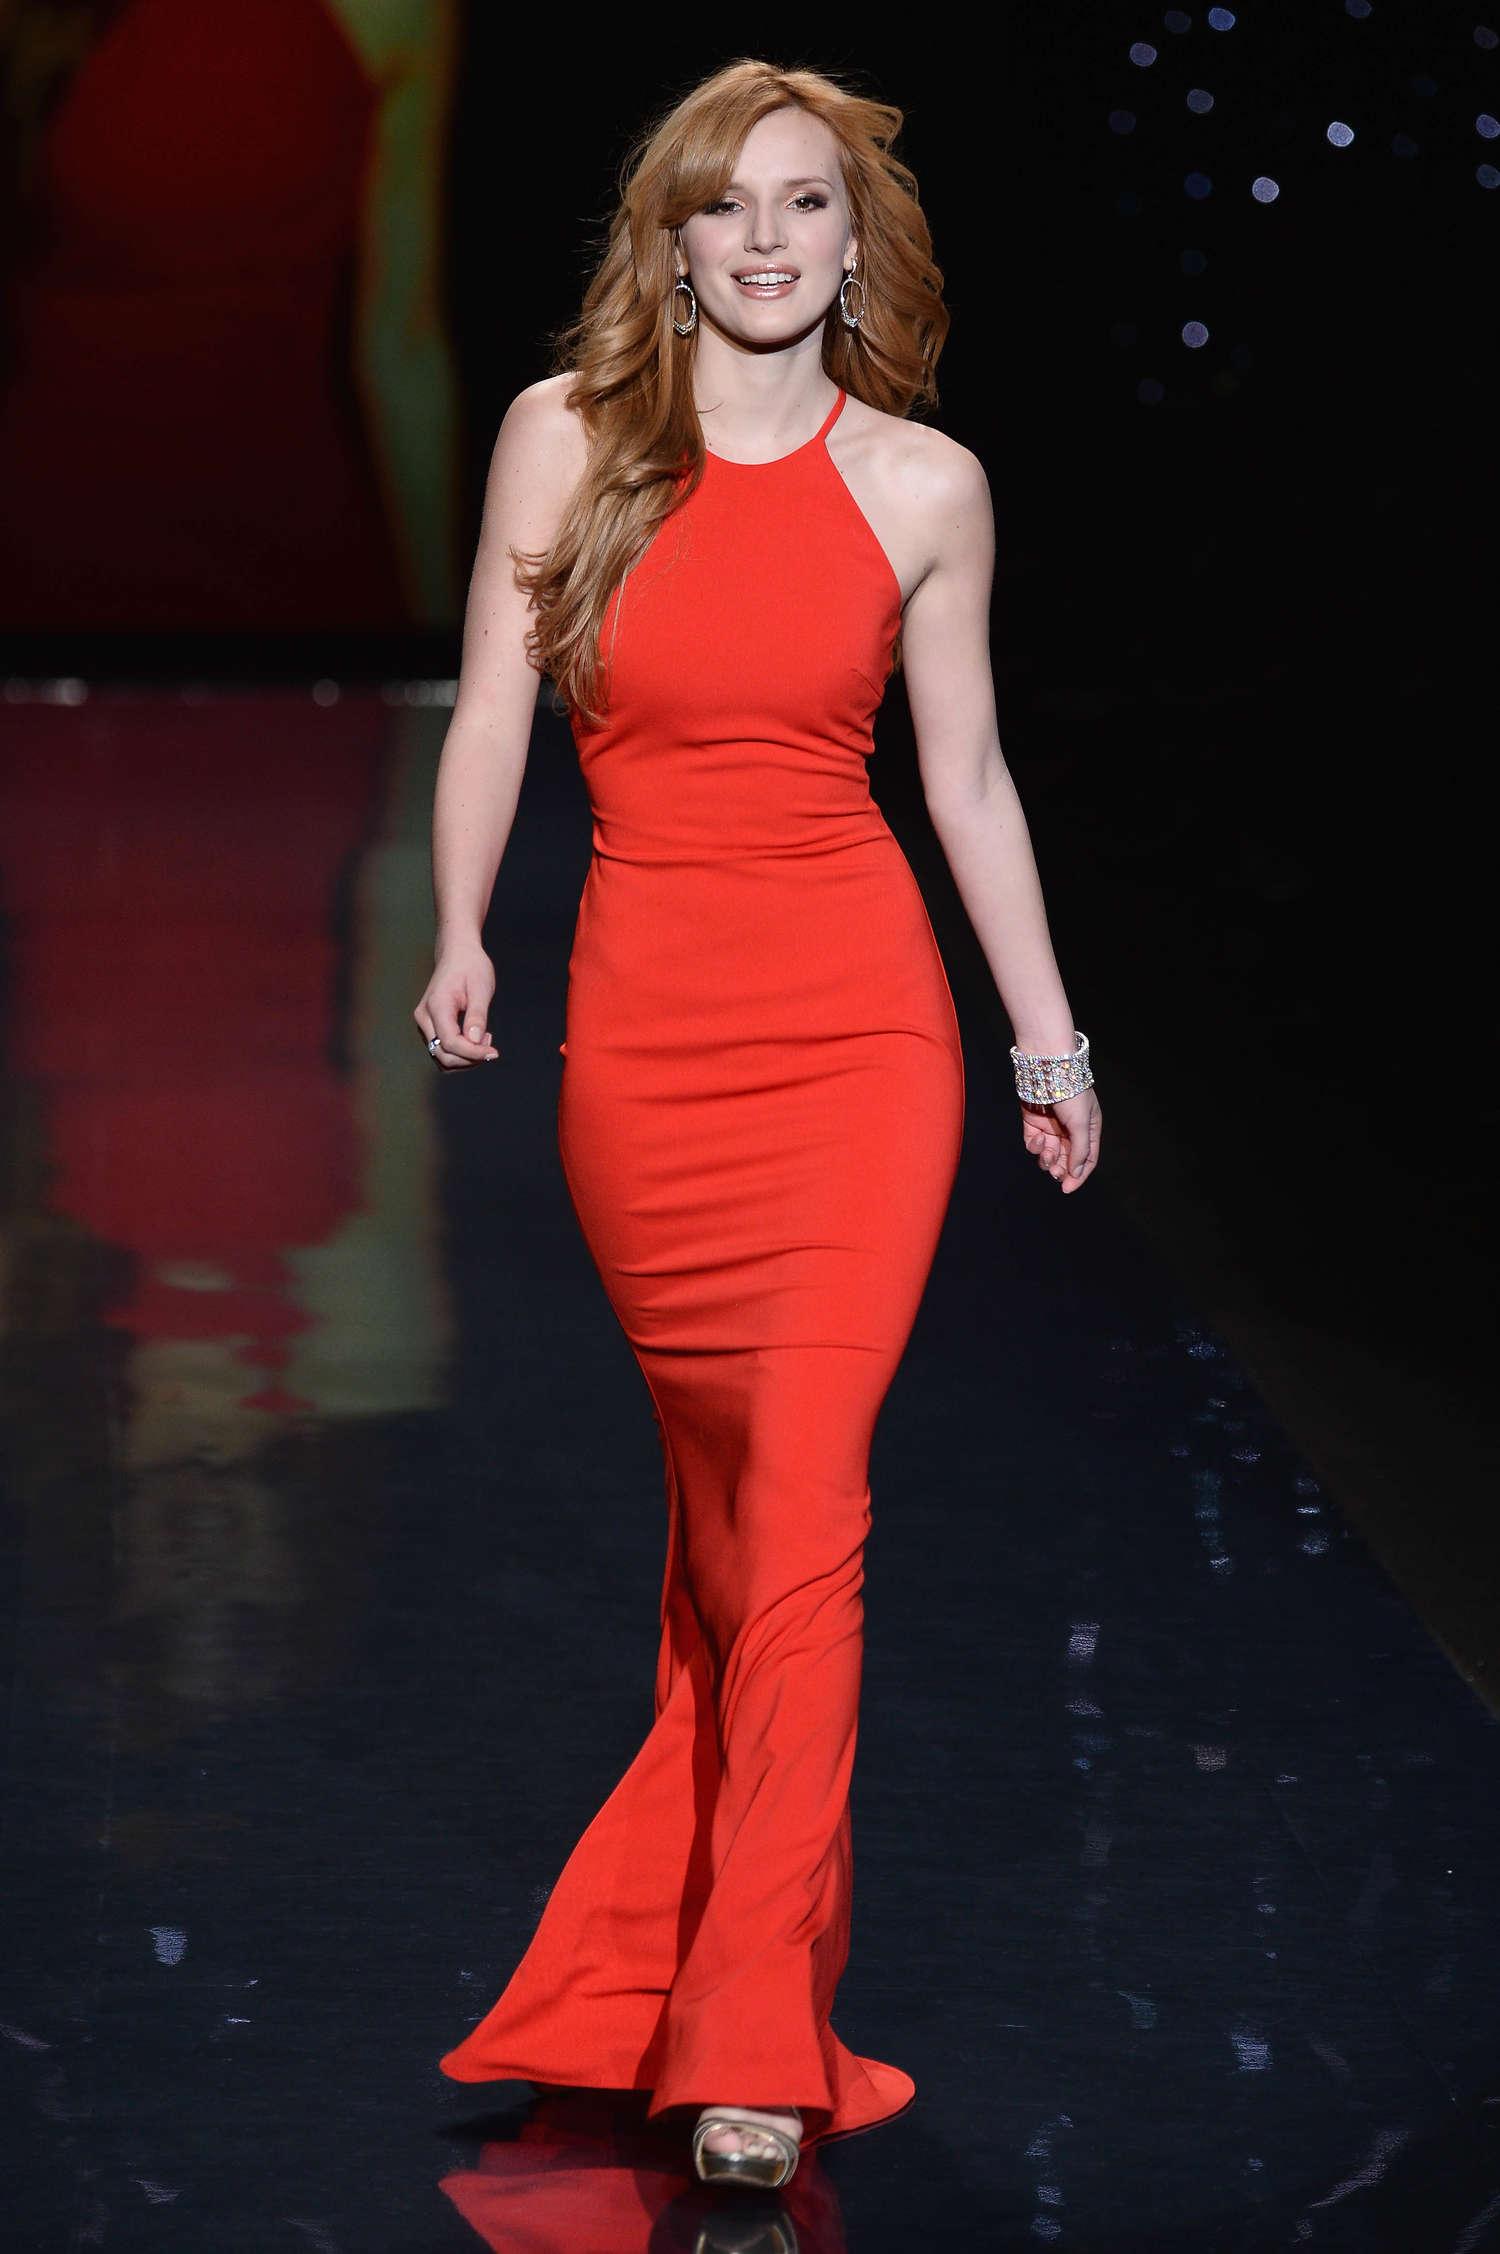 Bella Thorne 2014 Red Dress Fashion Show 02 Gotceleb